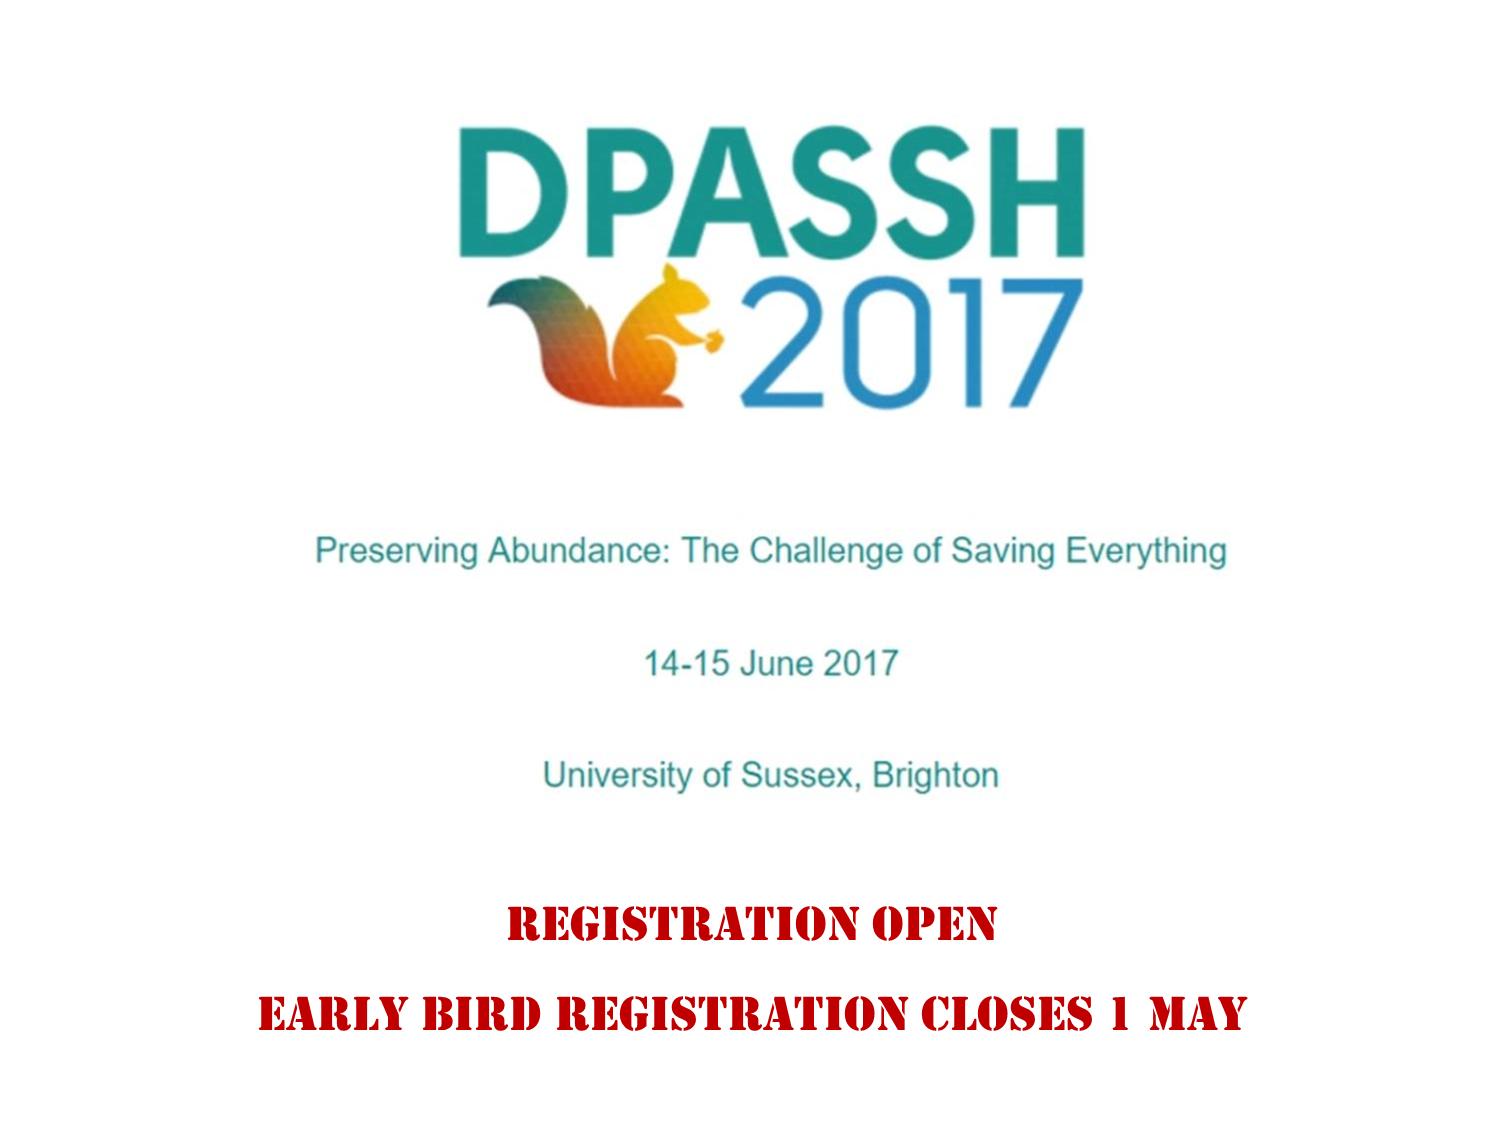 DPASSH 2017 Conference - Preserving Abundance: The Challenge of Saving Everything, 14-15 June 2017, Brighton, UK - Registration open